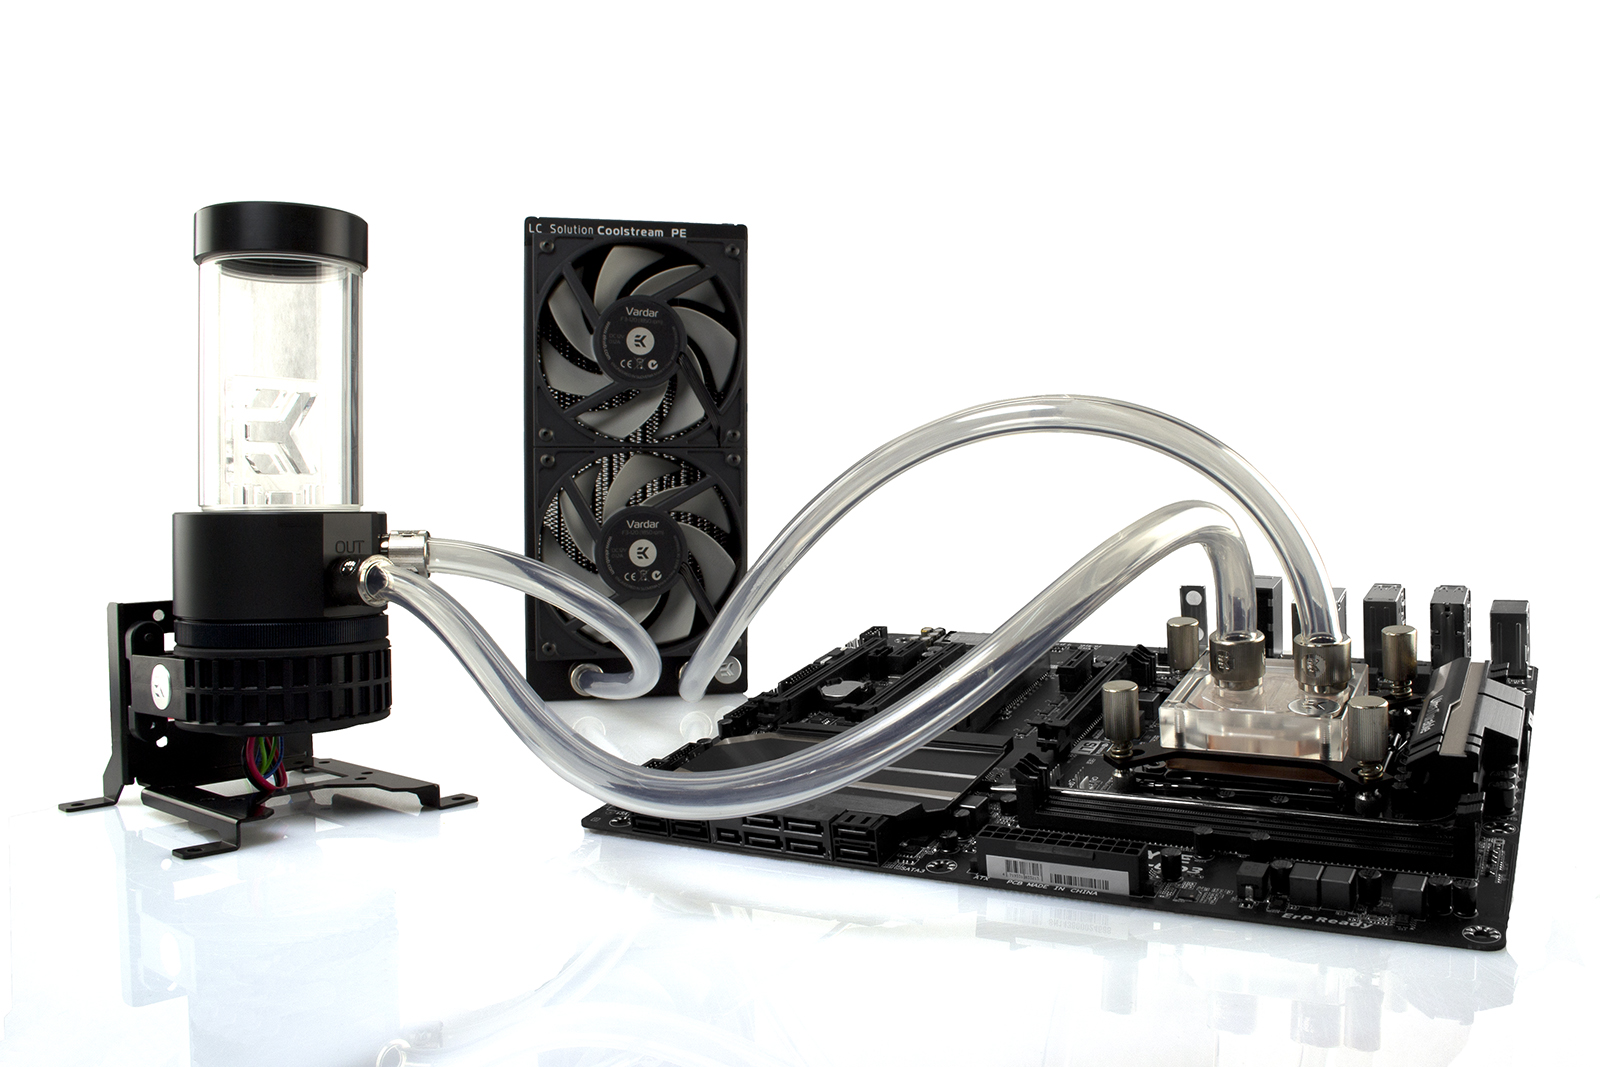 How to choose the right liquid cooling kit? - ekwb com